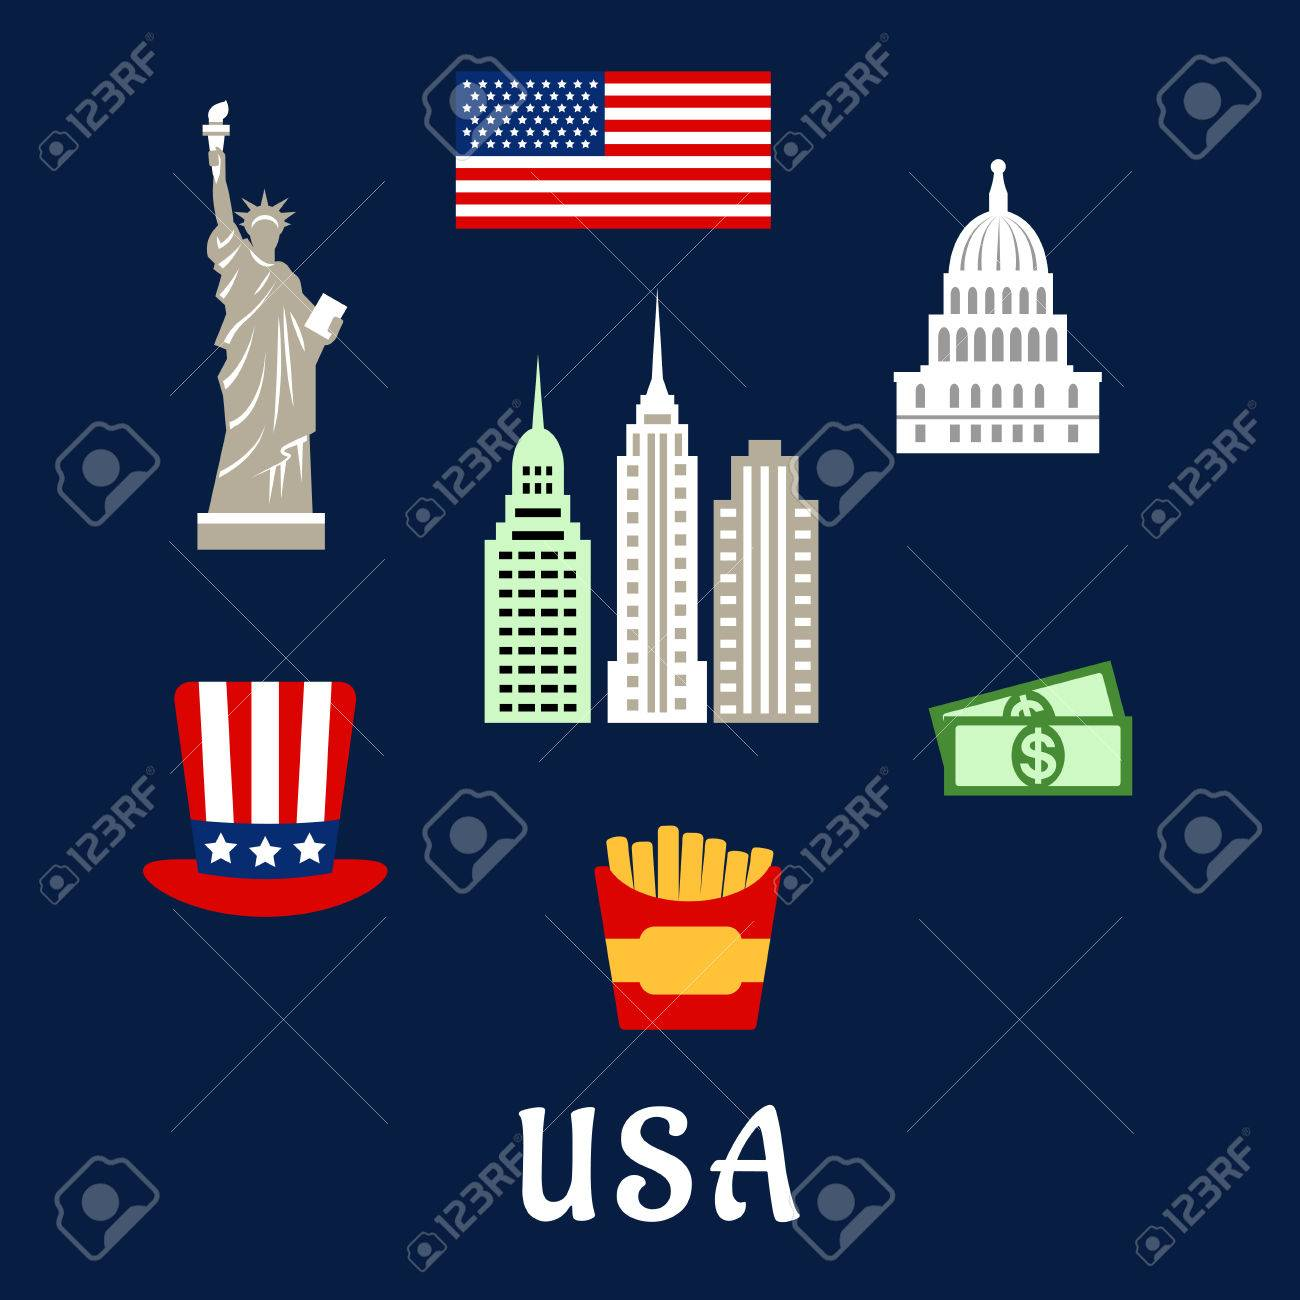 American Symbols Travel Flat Concept Depicting National Flag